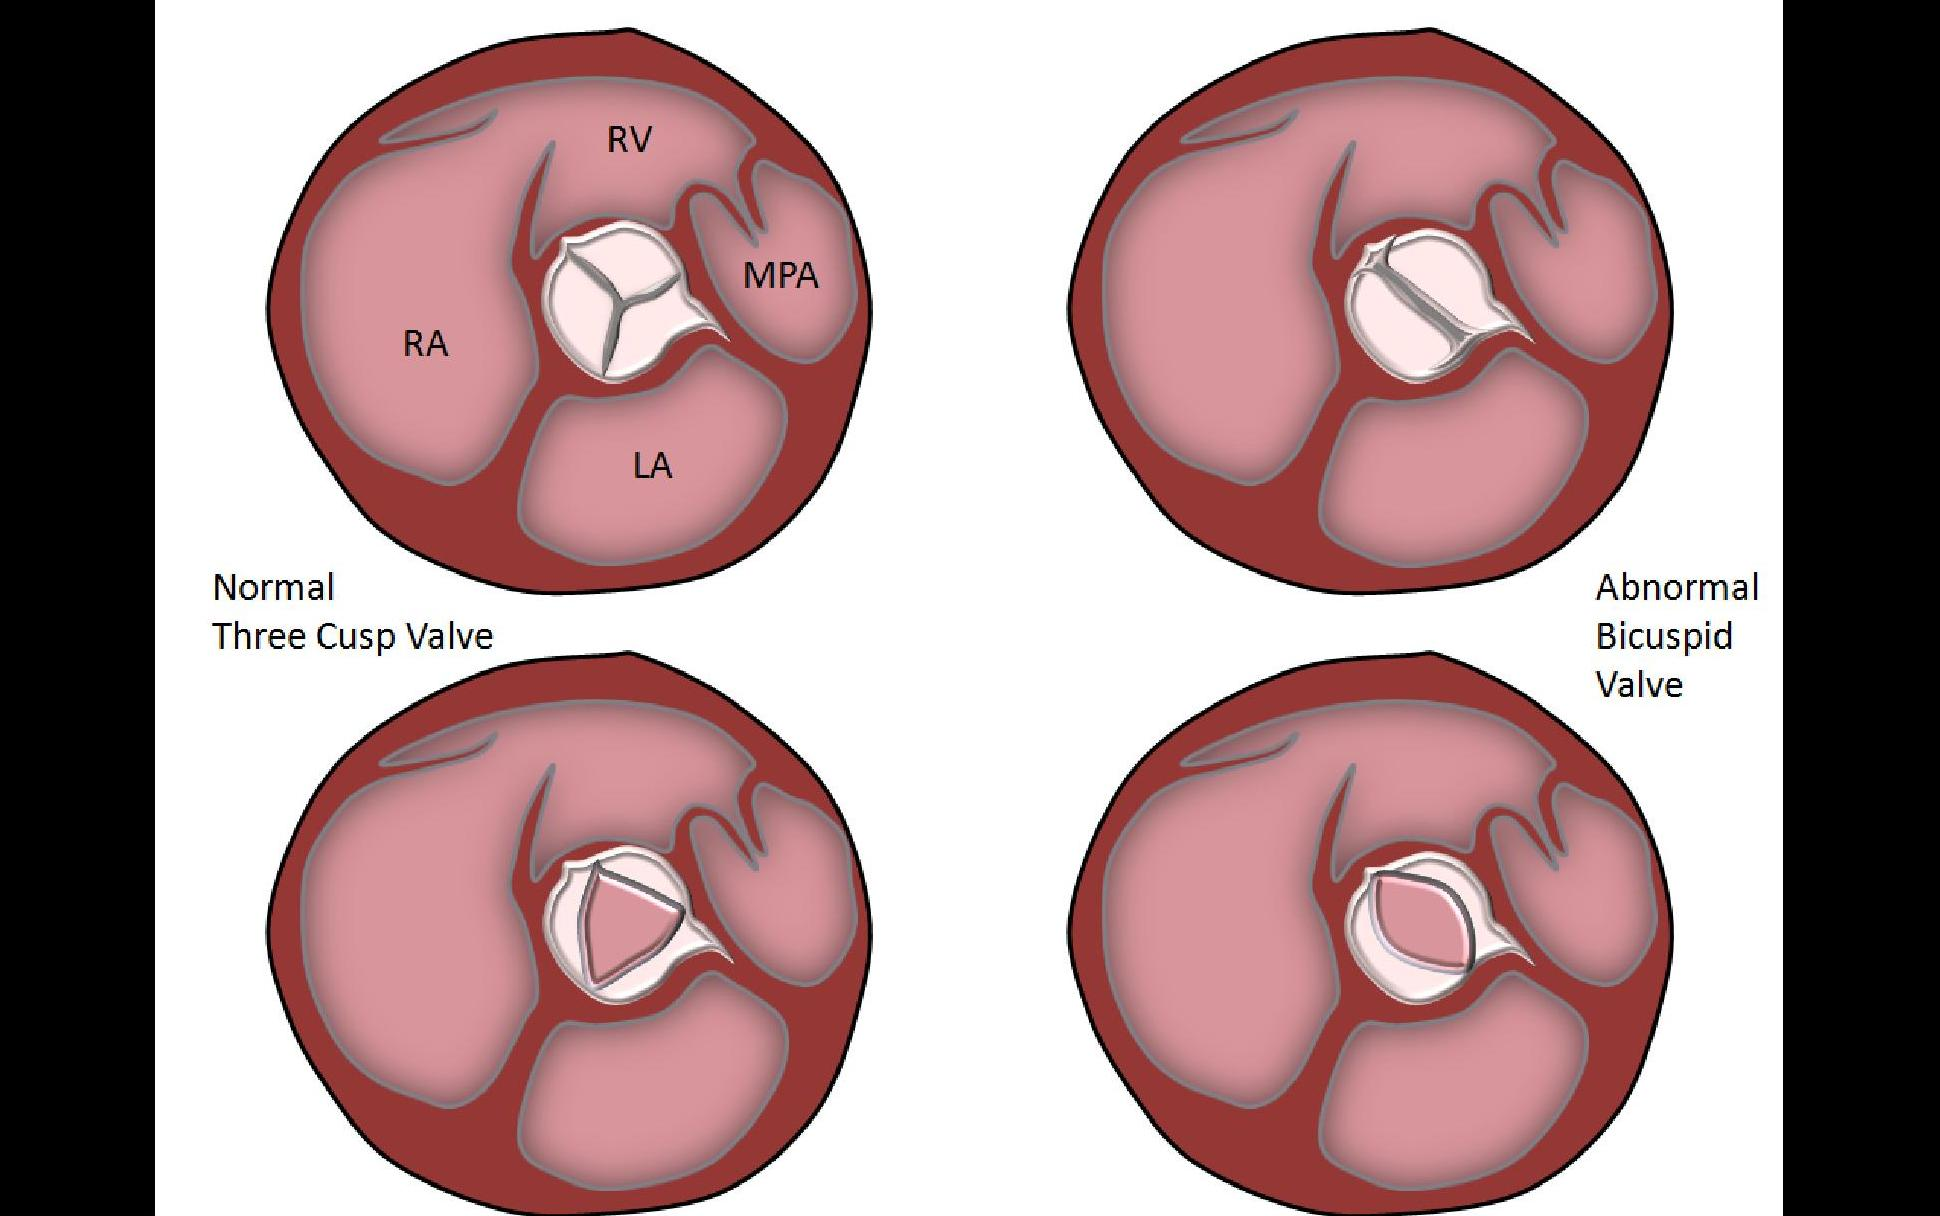 Ultrasound Registry Review - Valvular Abnormalities